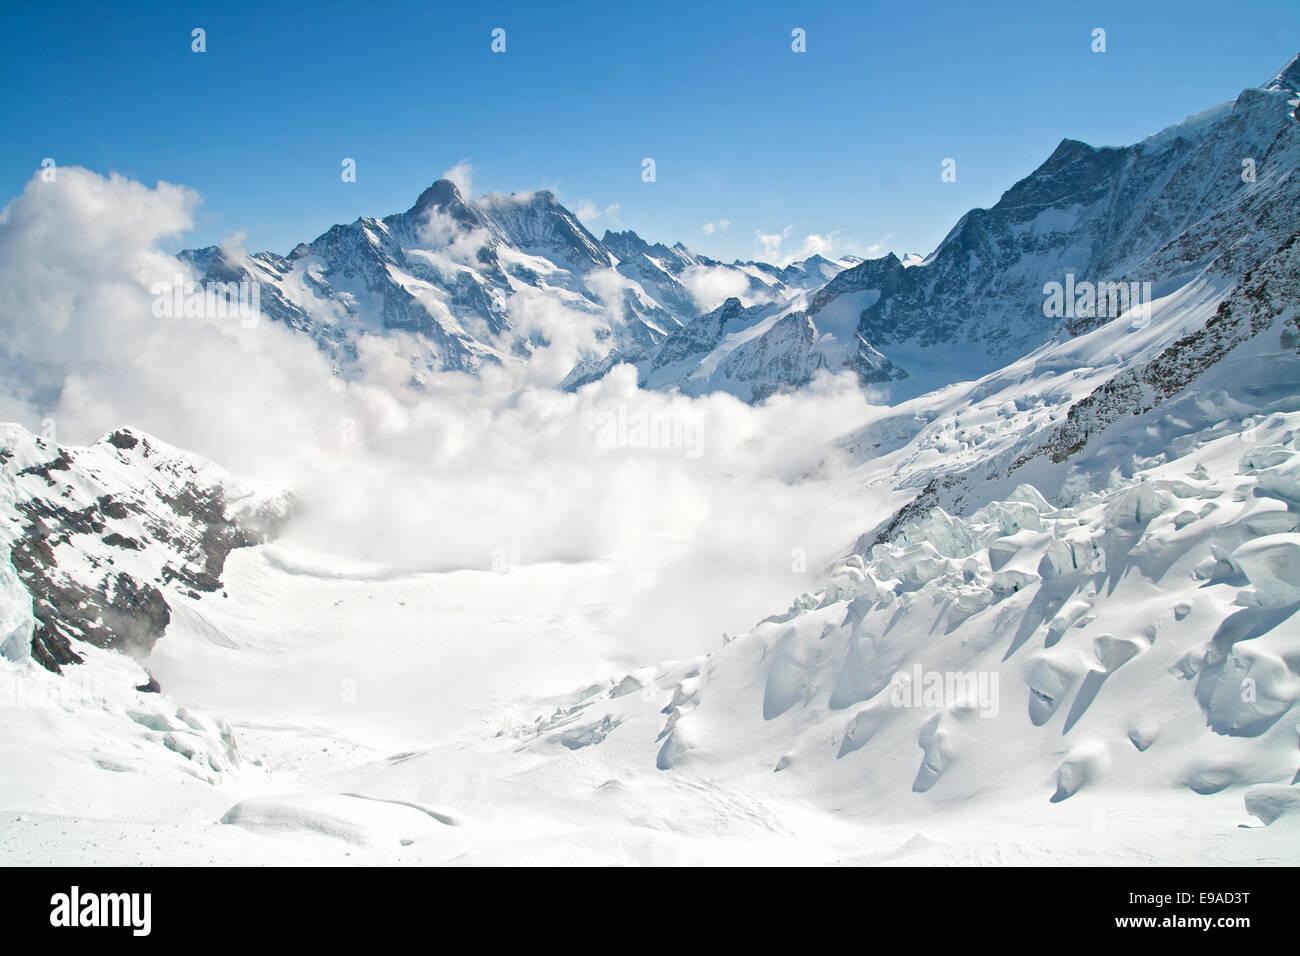 Jungfrau Bergkette in der Schweiz Stockbild